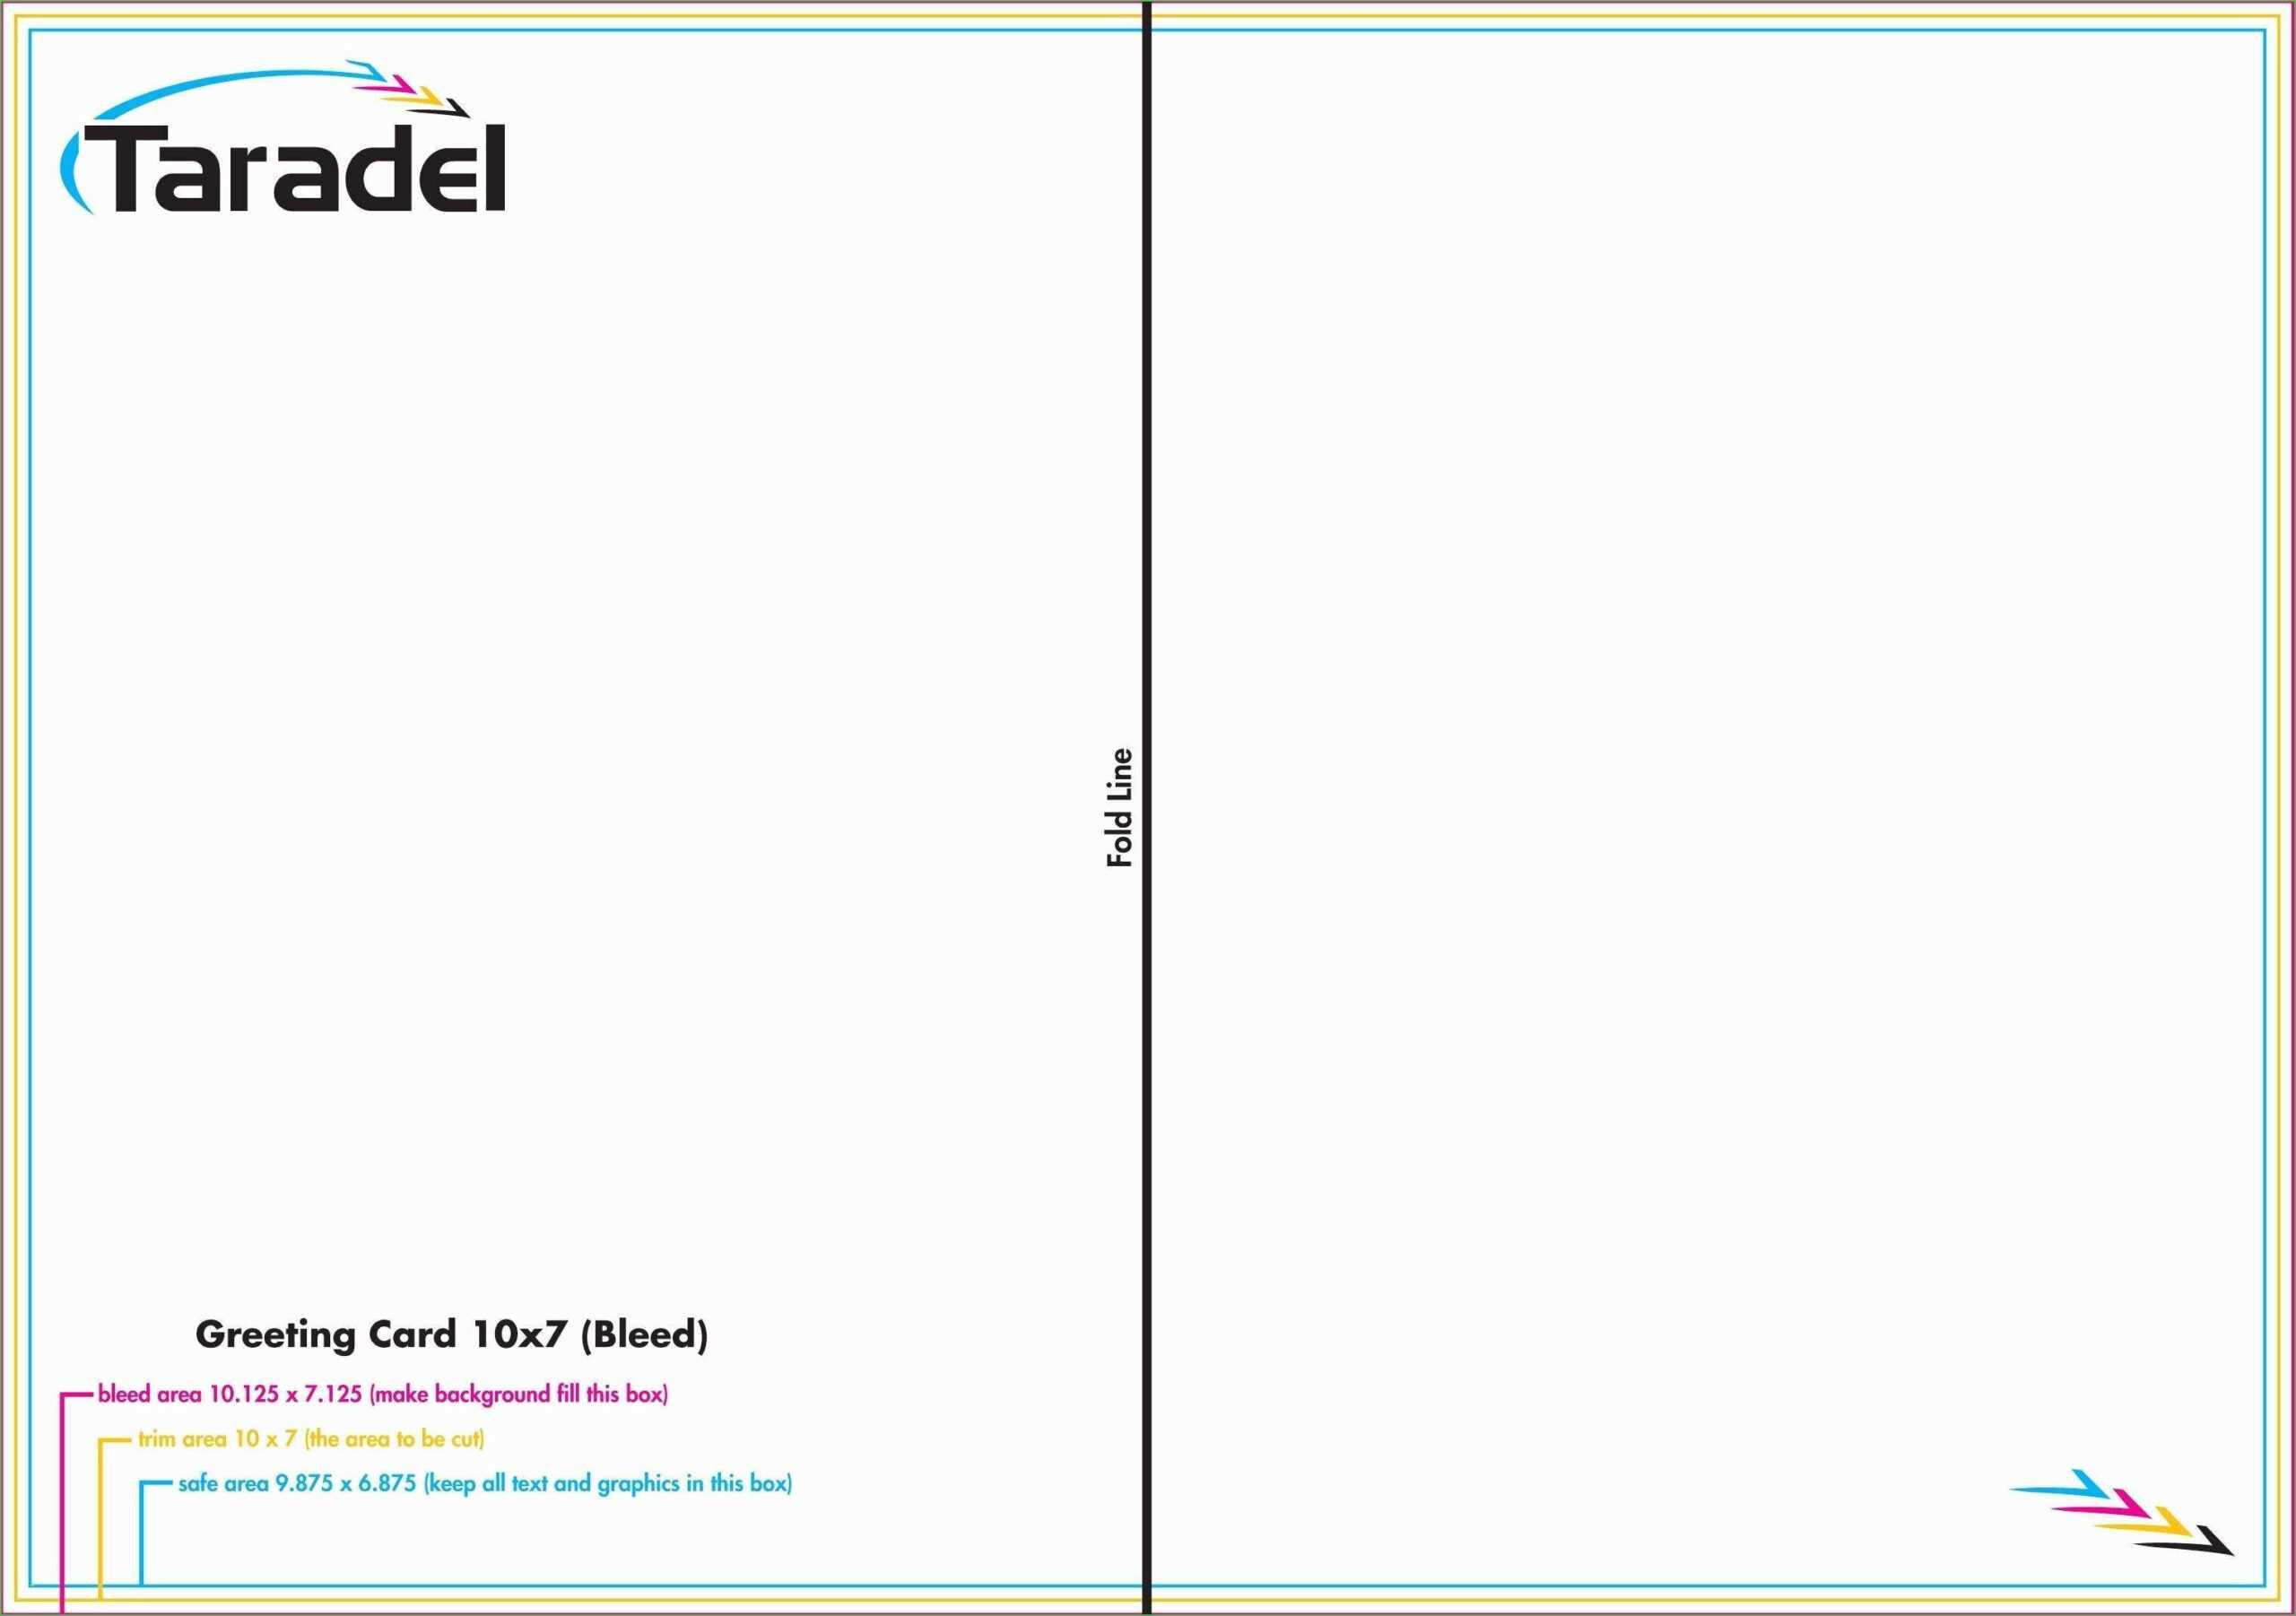 003 Quarter Fold Card Template Photoshop Indesign Greeting For Indesign Birthday Card Template